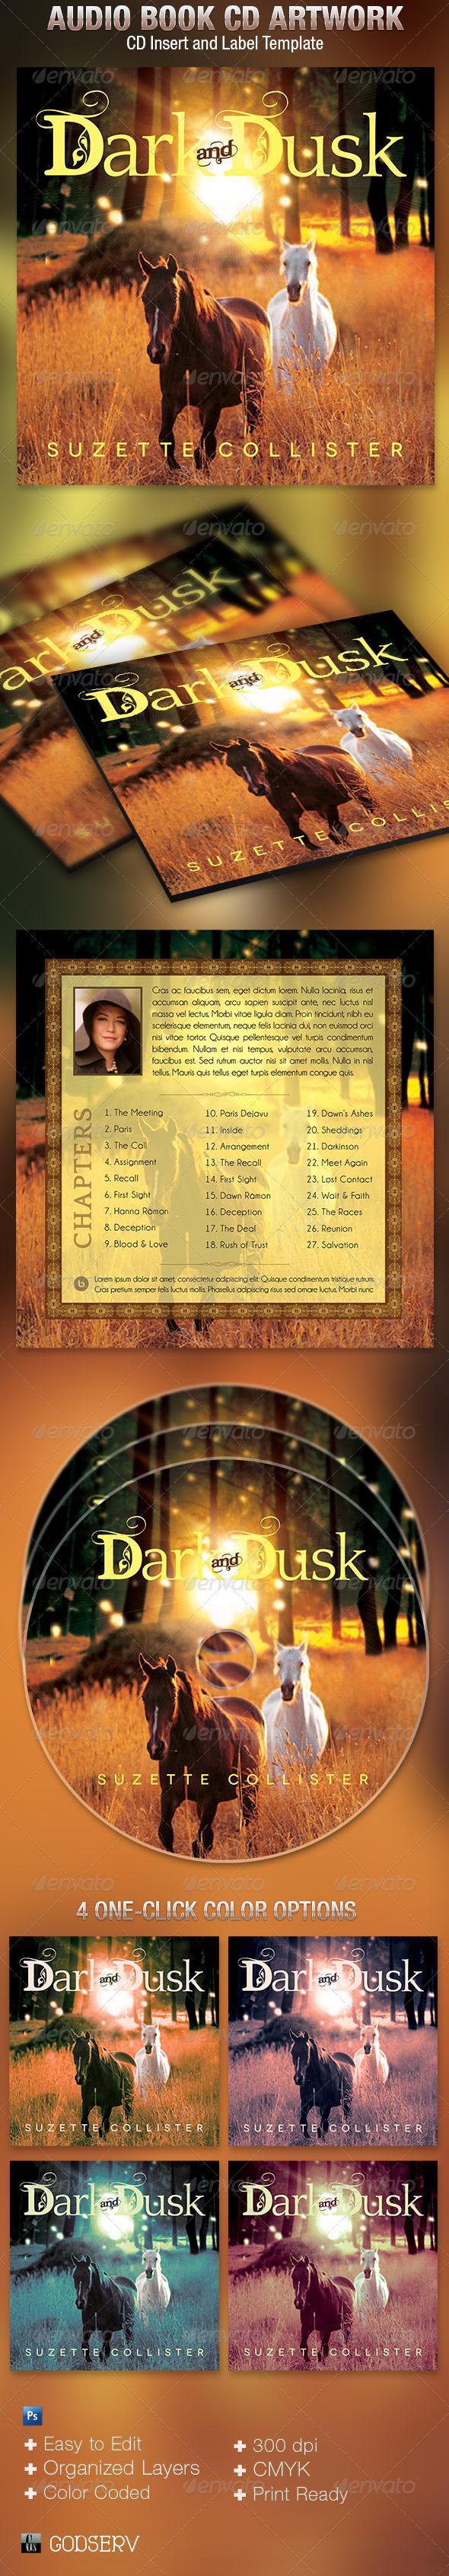 GraphicRiver Audio Book CD Artwork Template 5150698